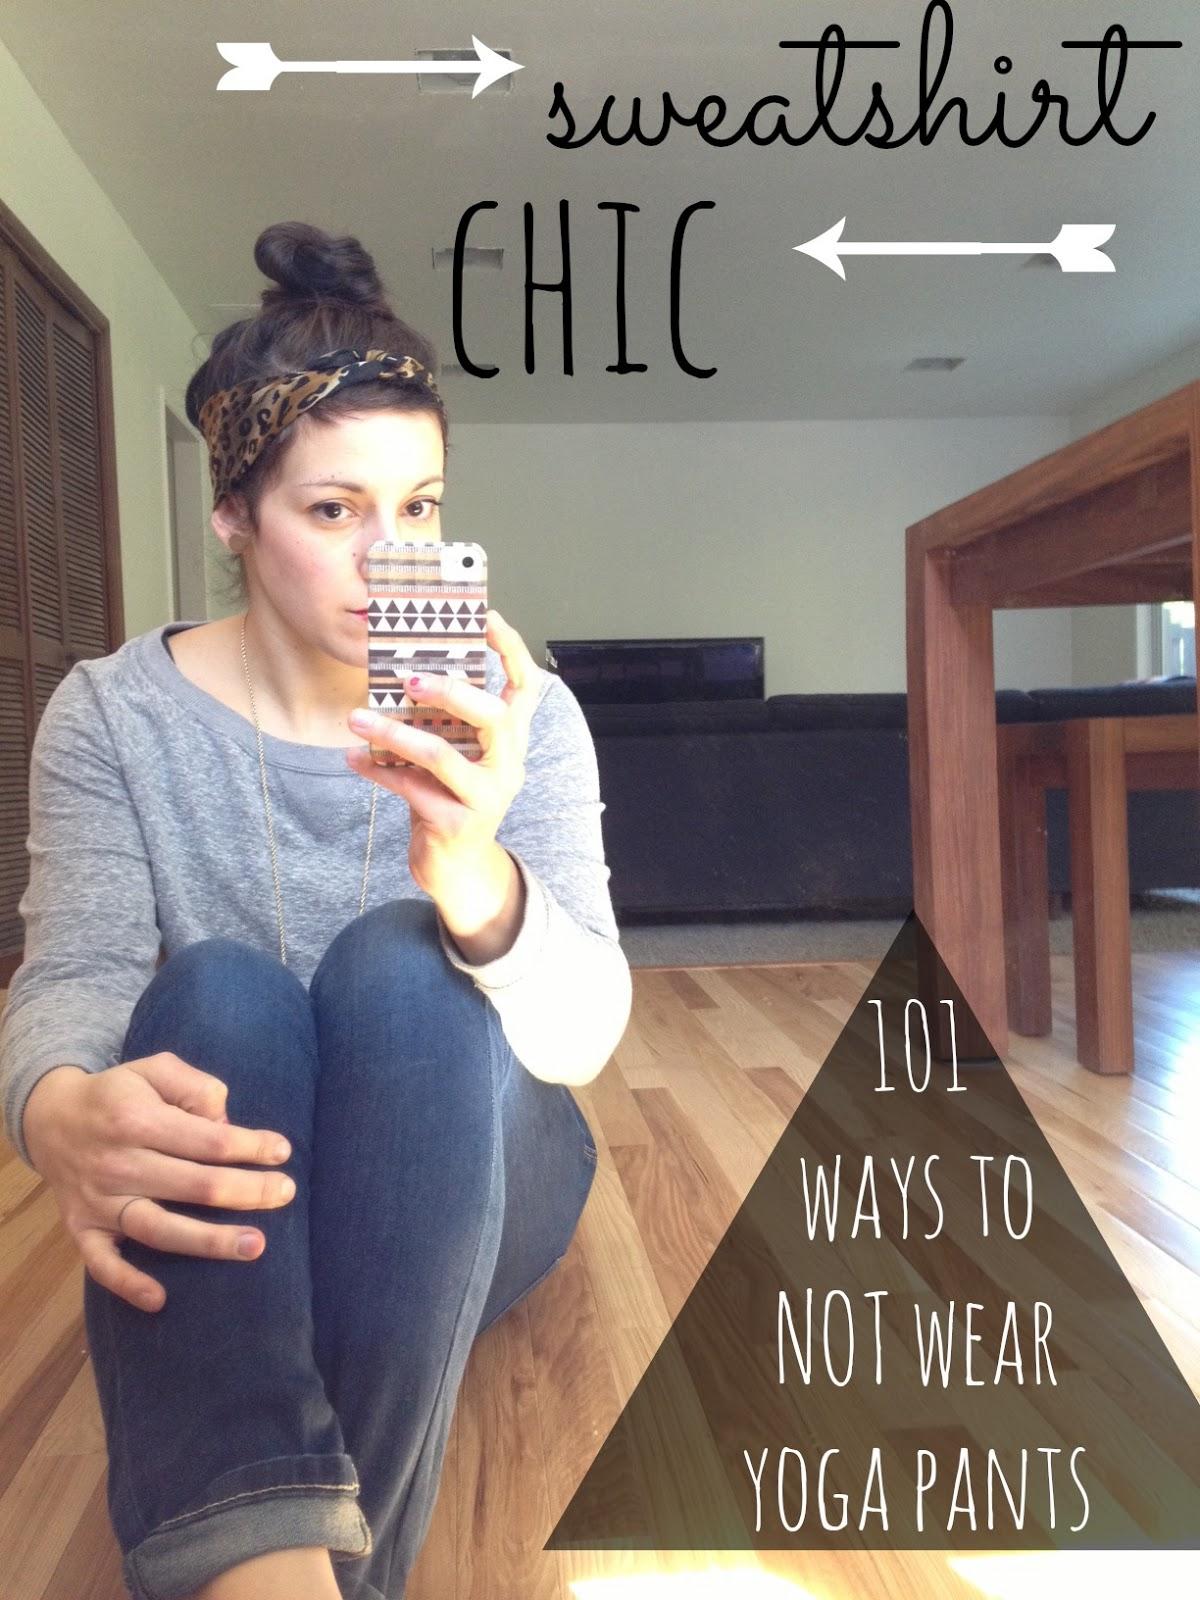 101 ways to not wear yoga pants sweatshirt chic